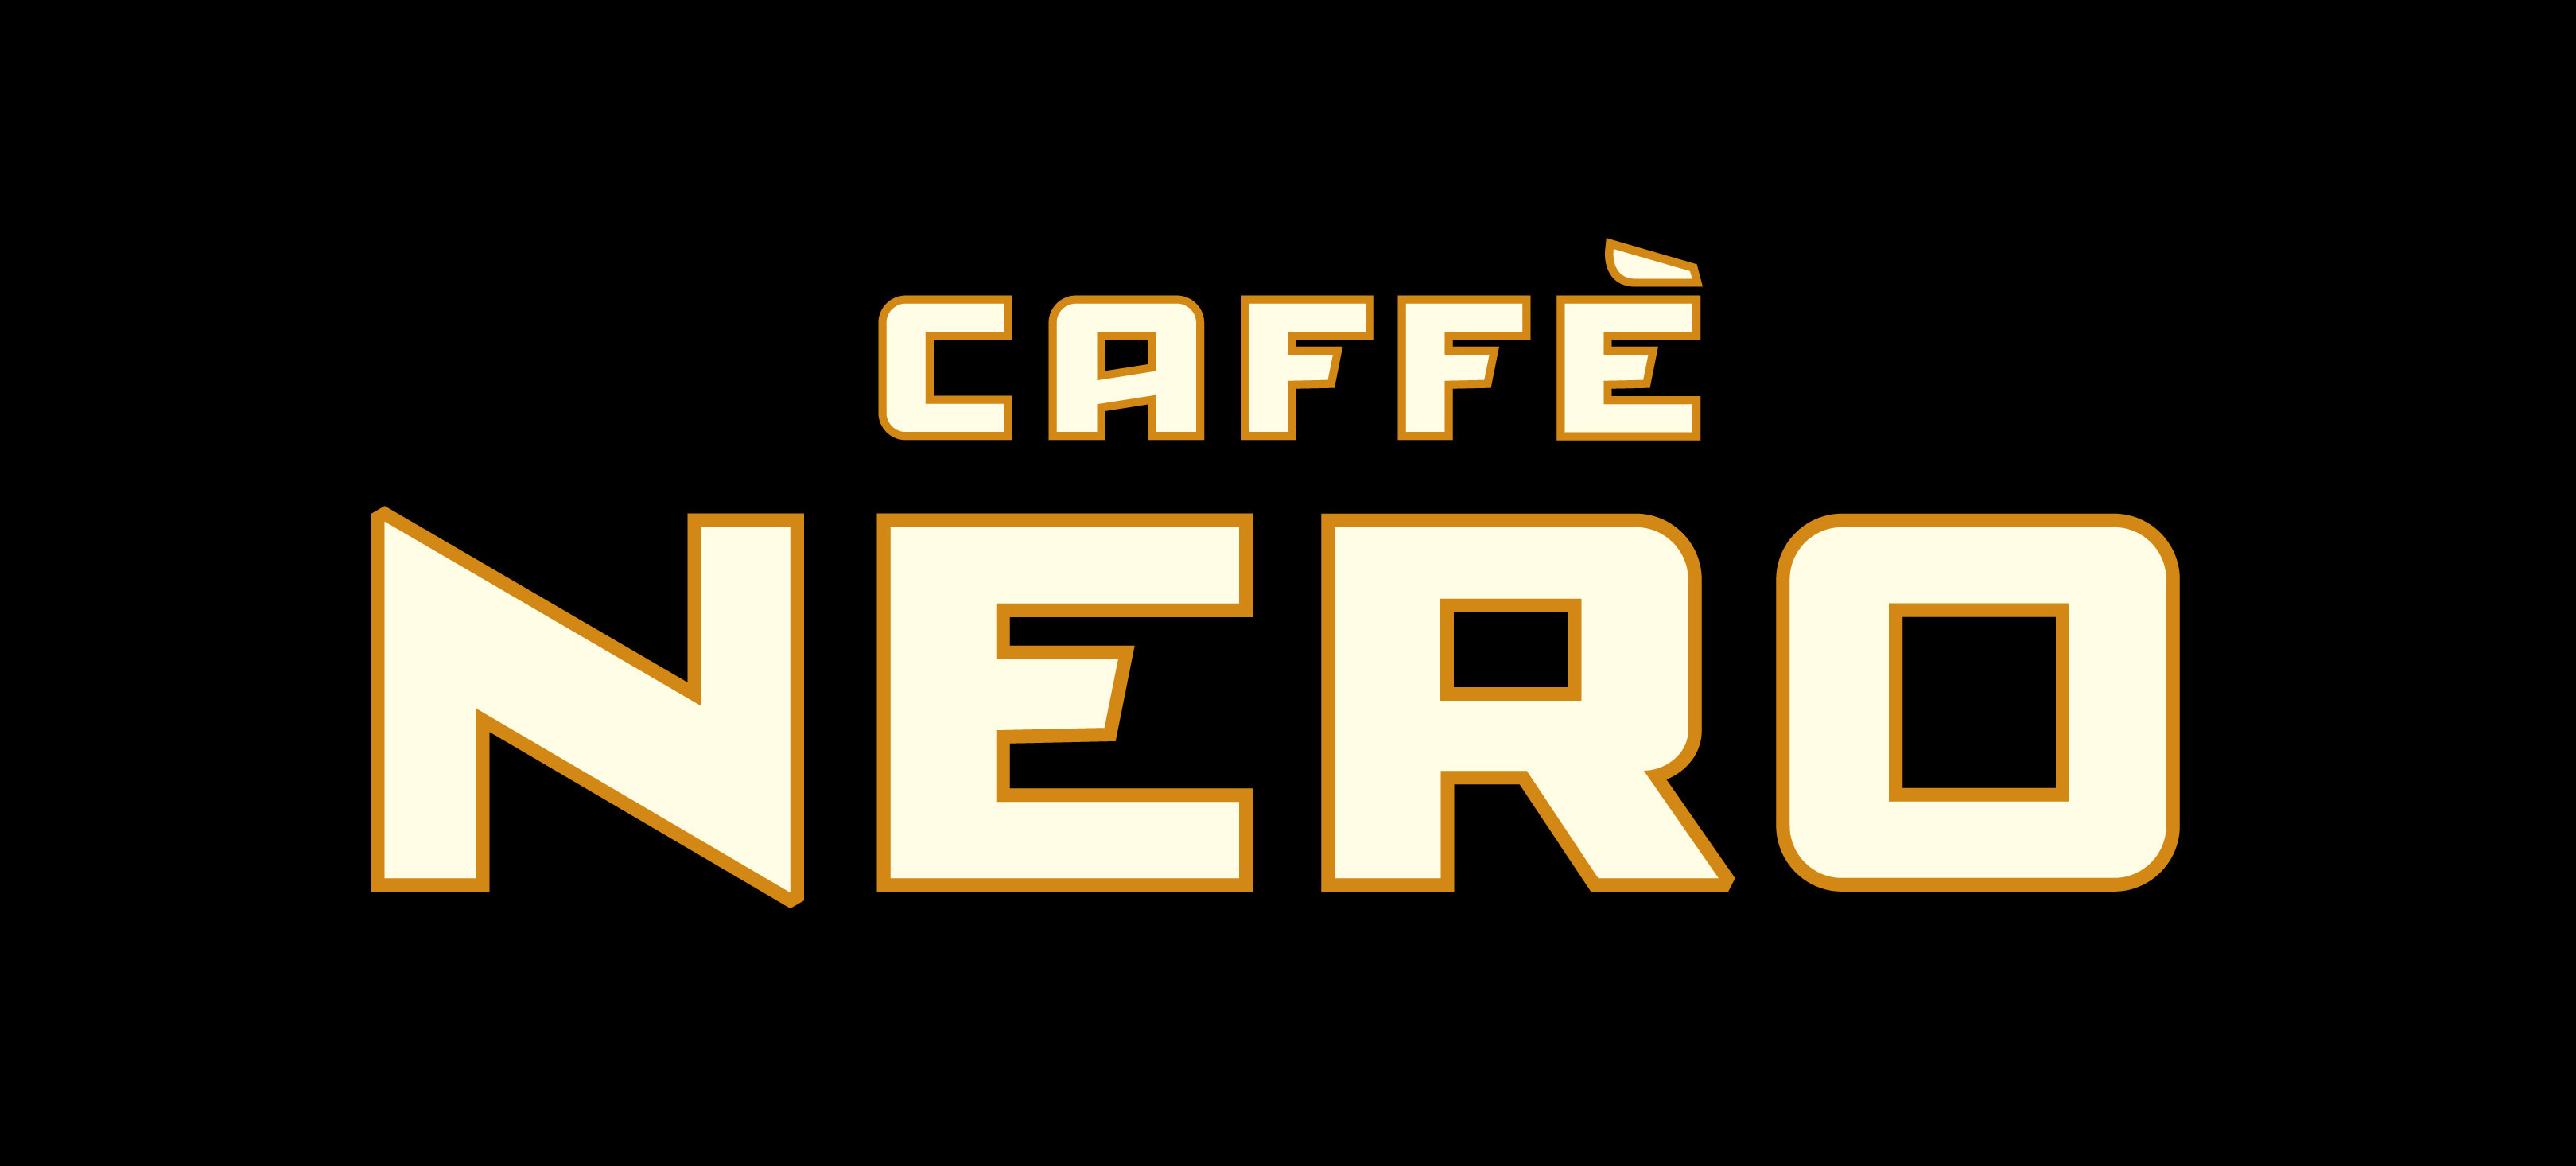 CAFFE NERO_CMYK_BRONZE_IVORY